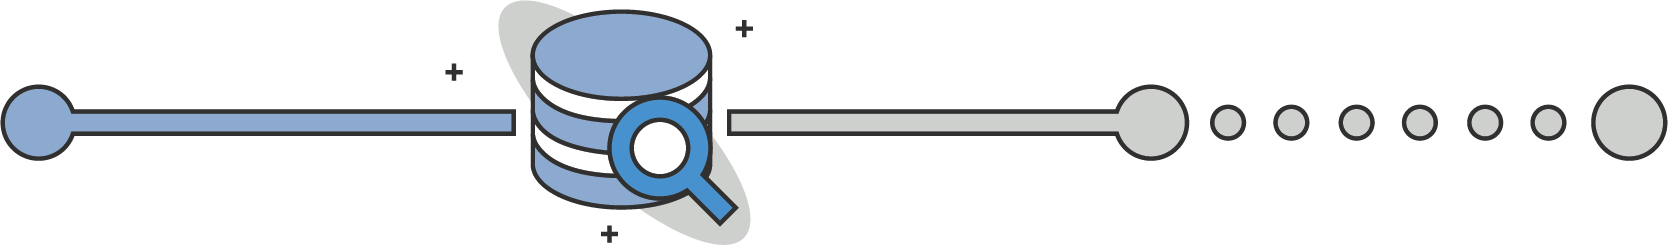 Access Customer Segments